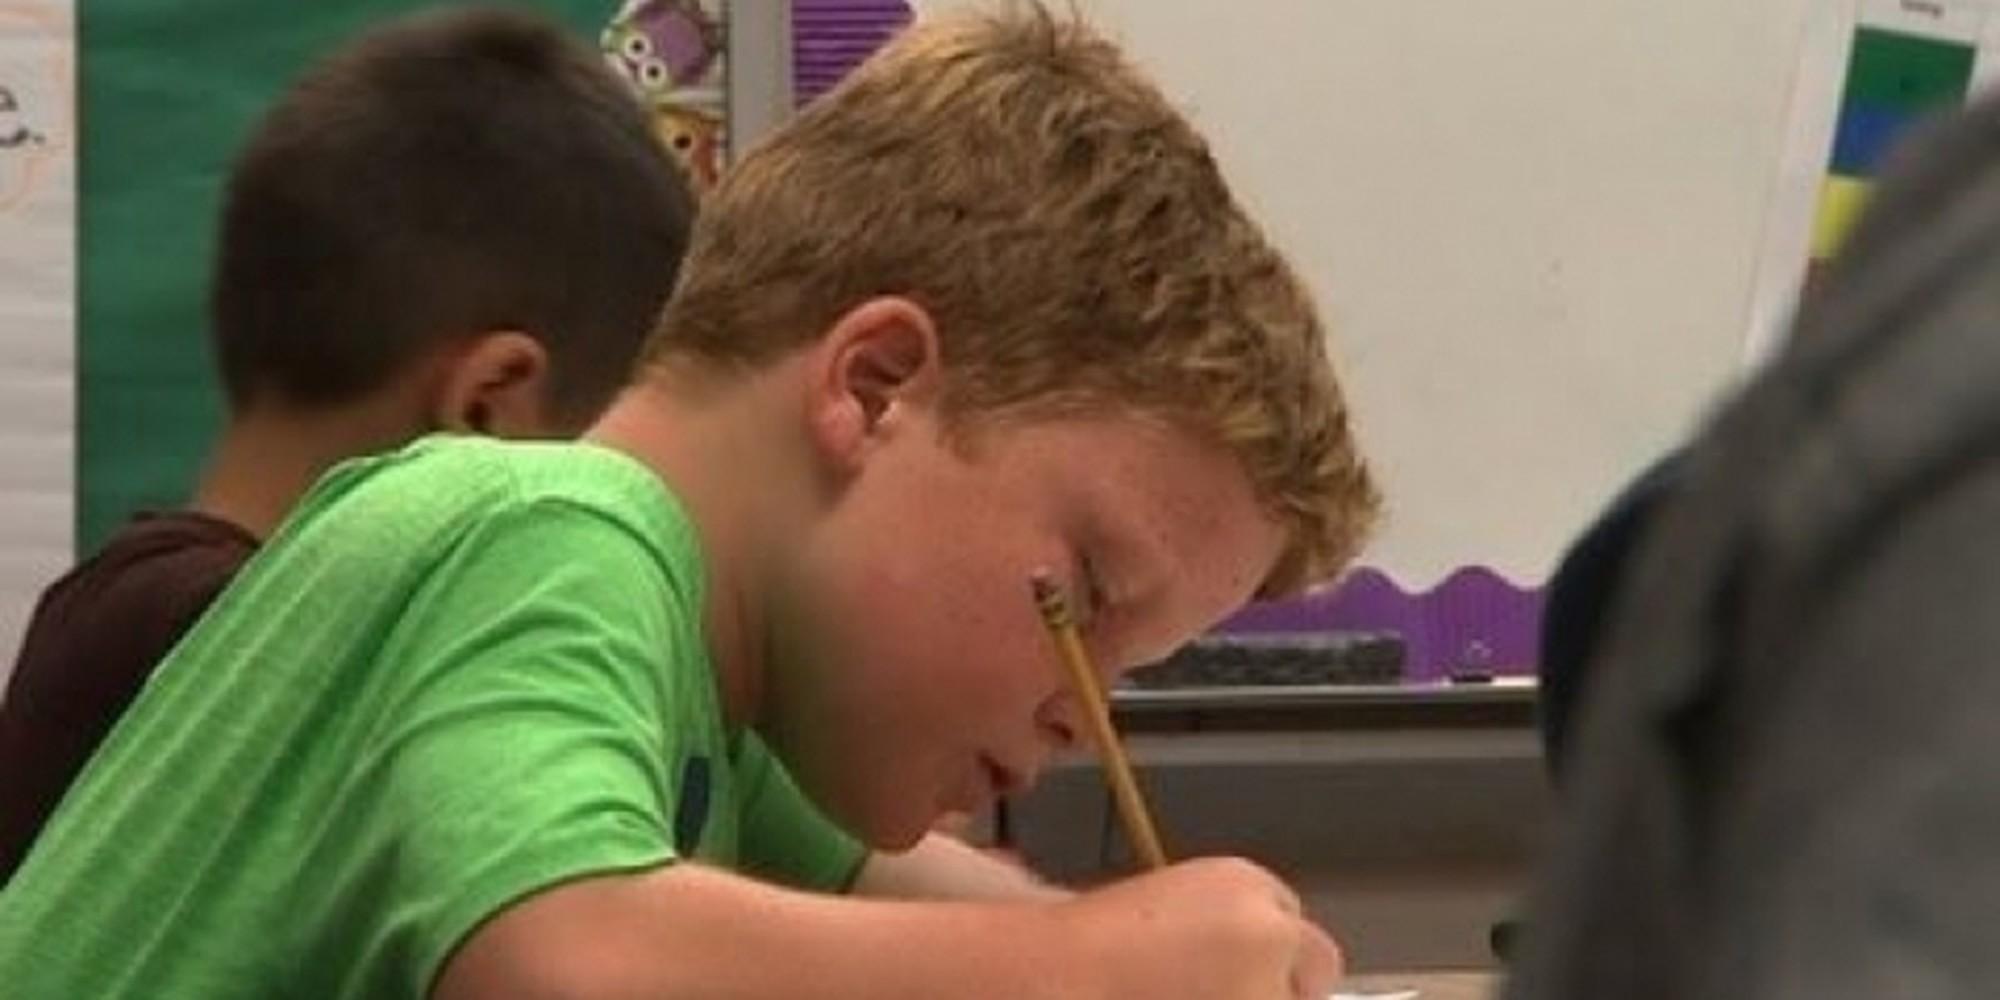 Homework should not be mandatory